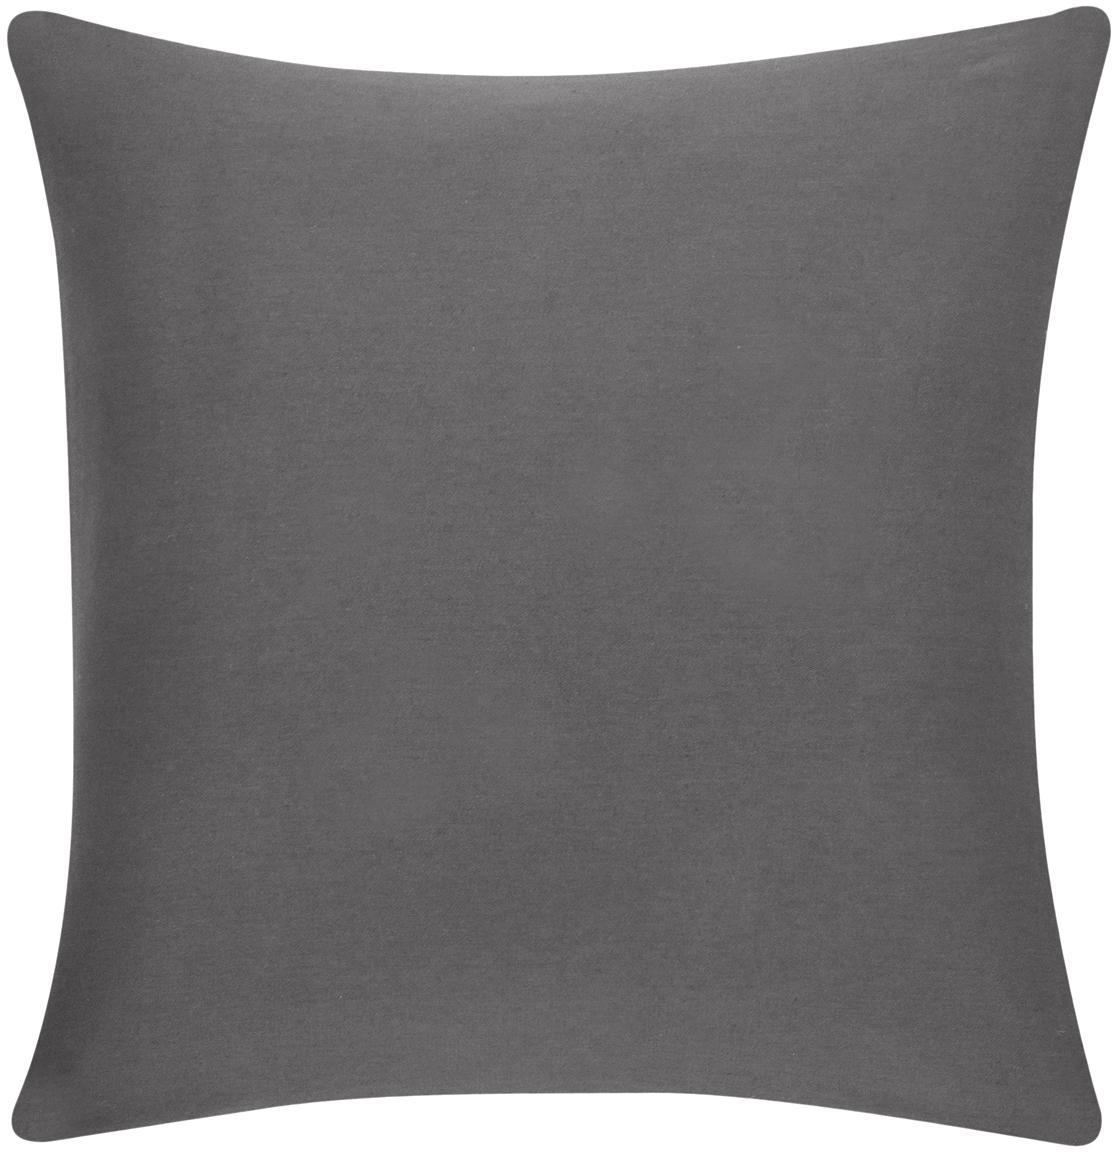 Funda de cojín de algodón Mads, 100%algodón, Gris oscuro, An 40 x L 40 cm